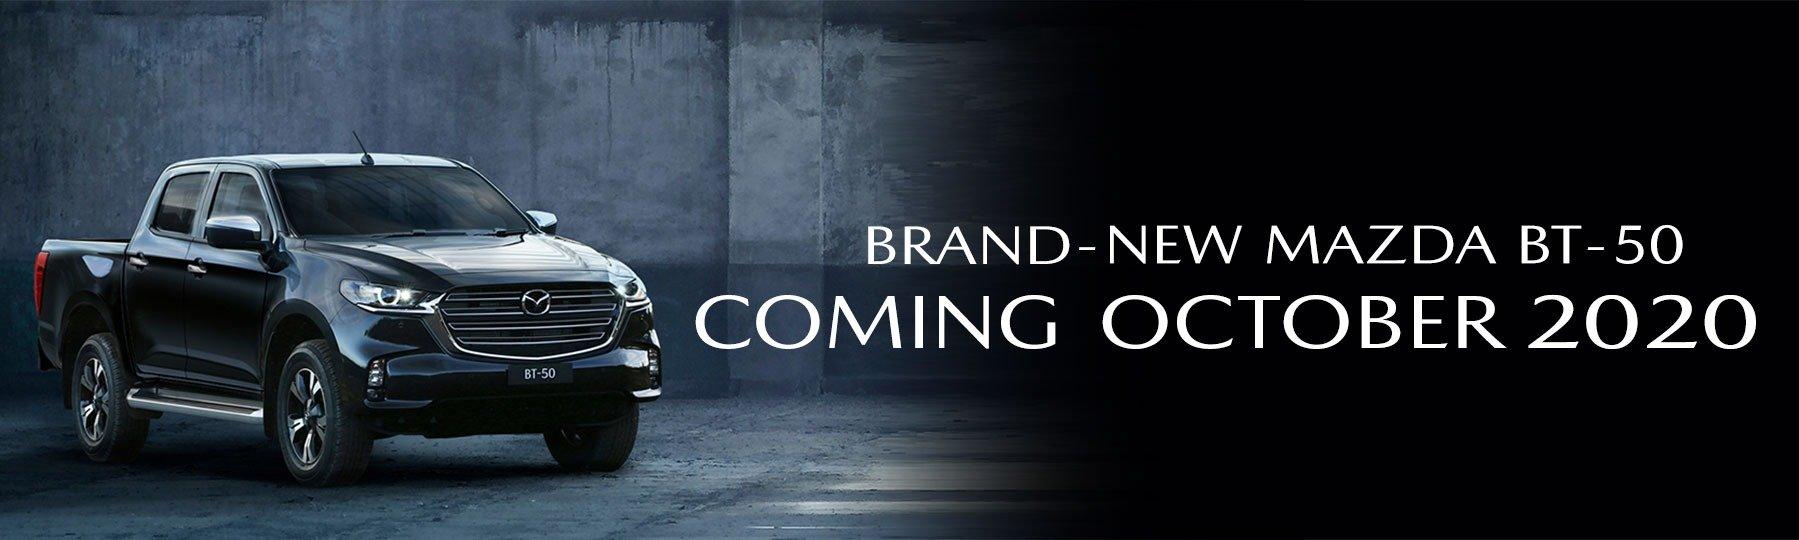 Brand New Mazda BT-50 Coming Soon